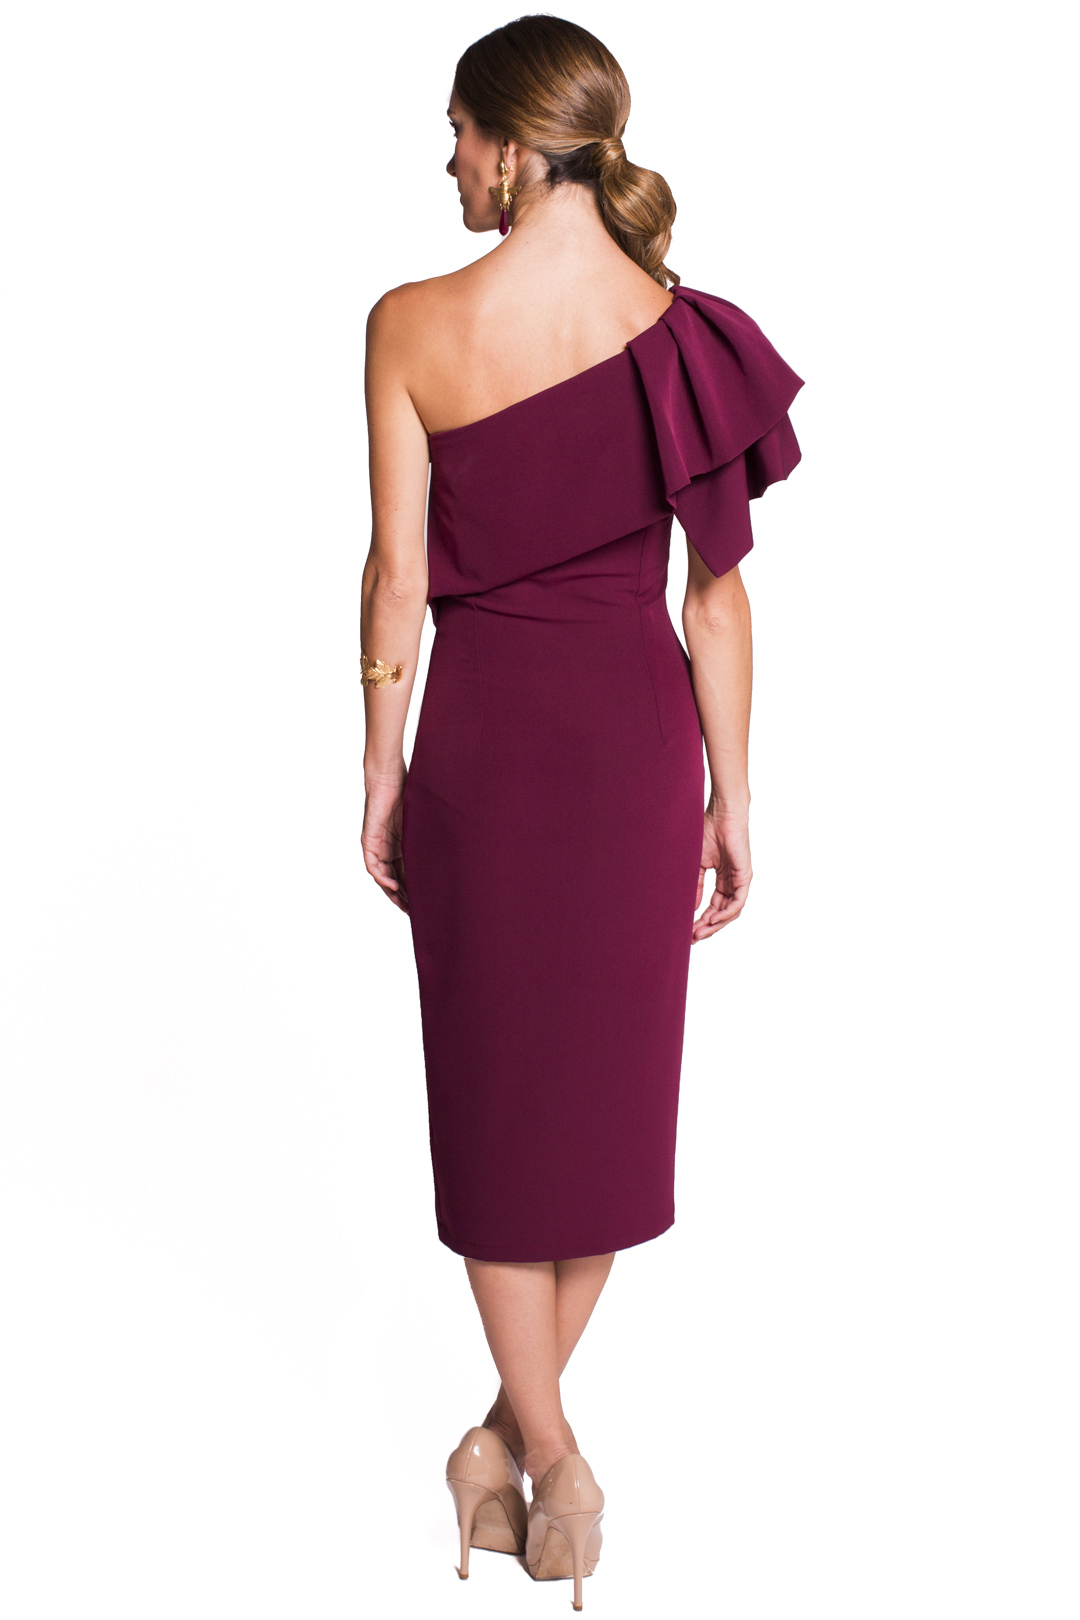 left - Vestido Triana Burgundy